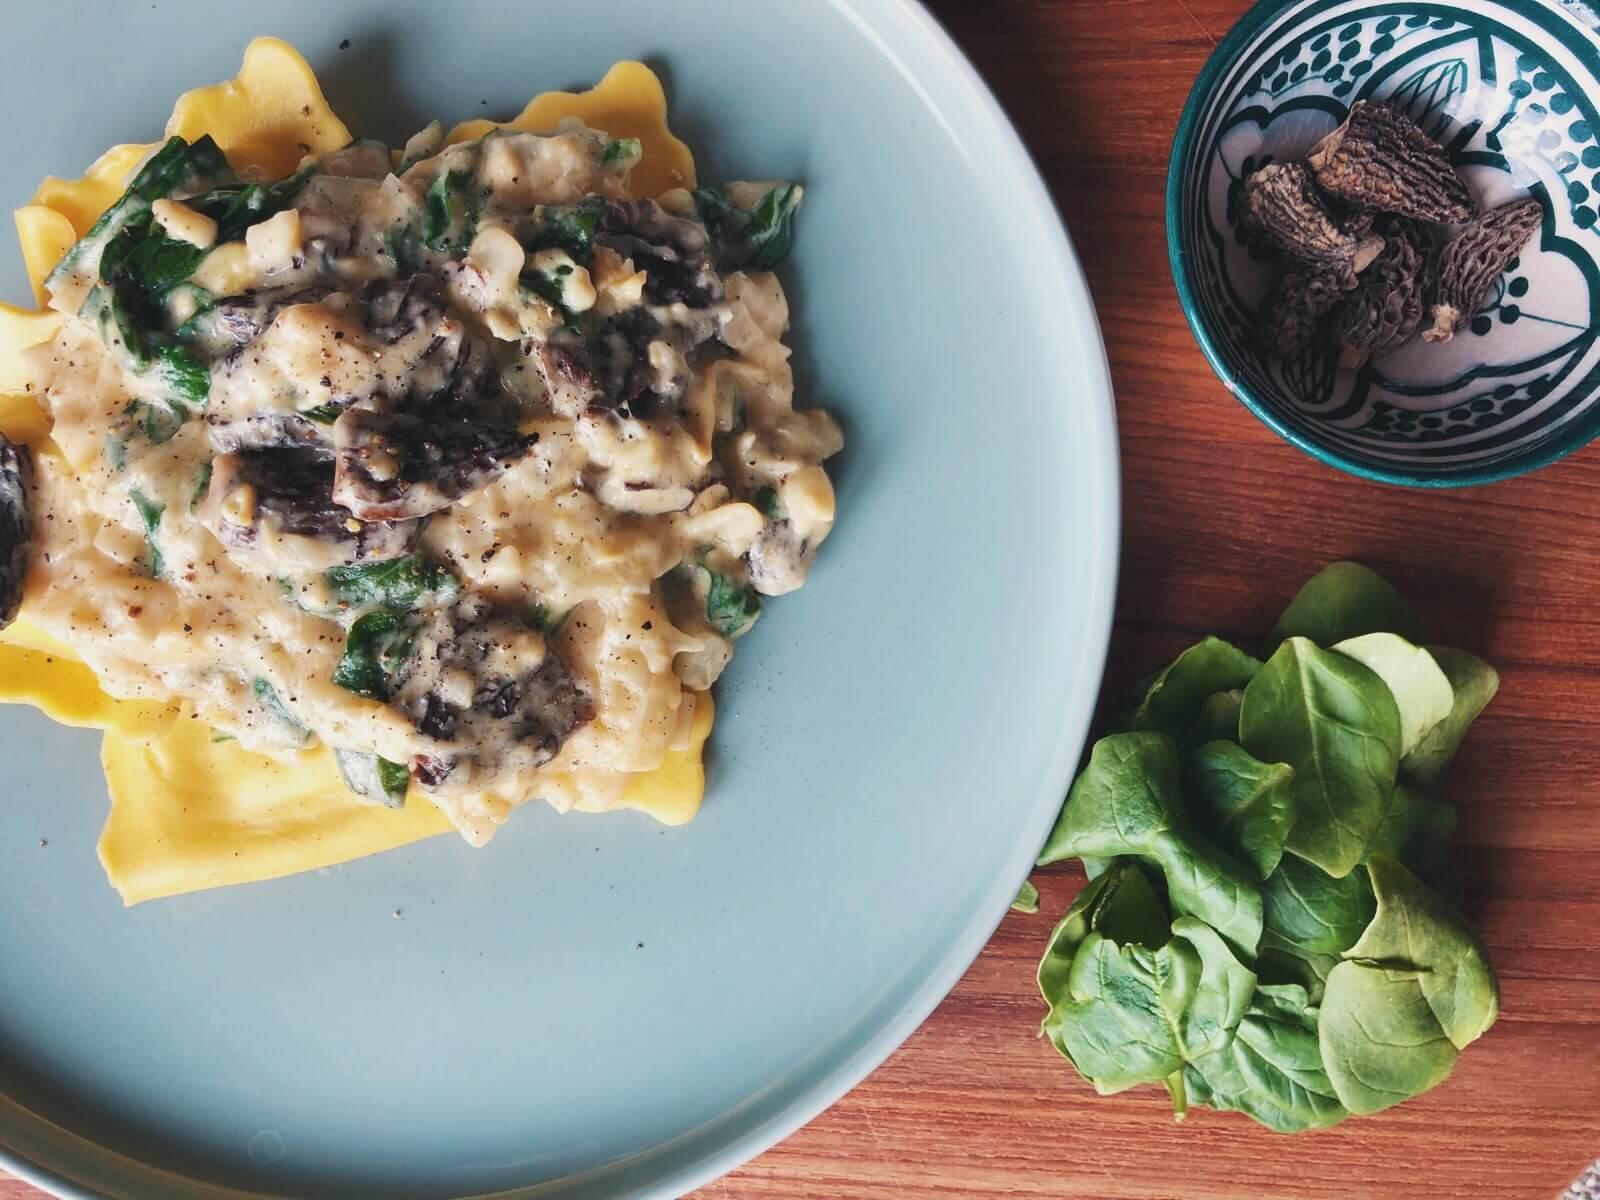 ravioli med morkel sauce ingredienser